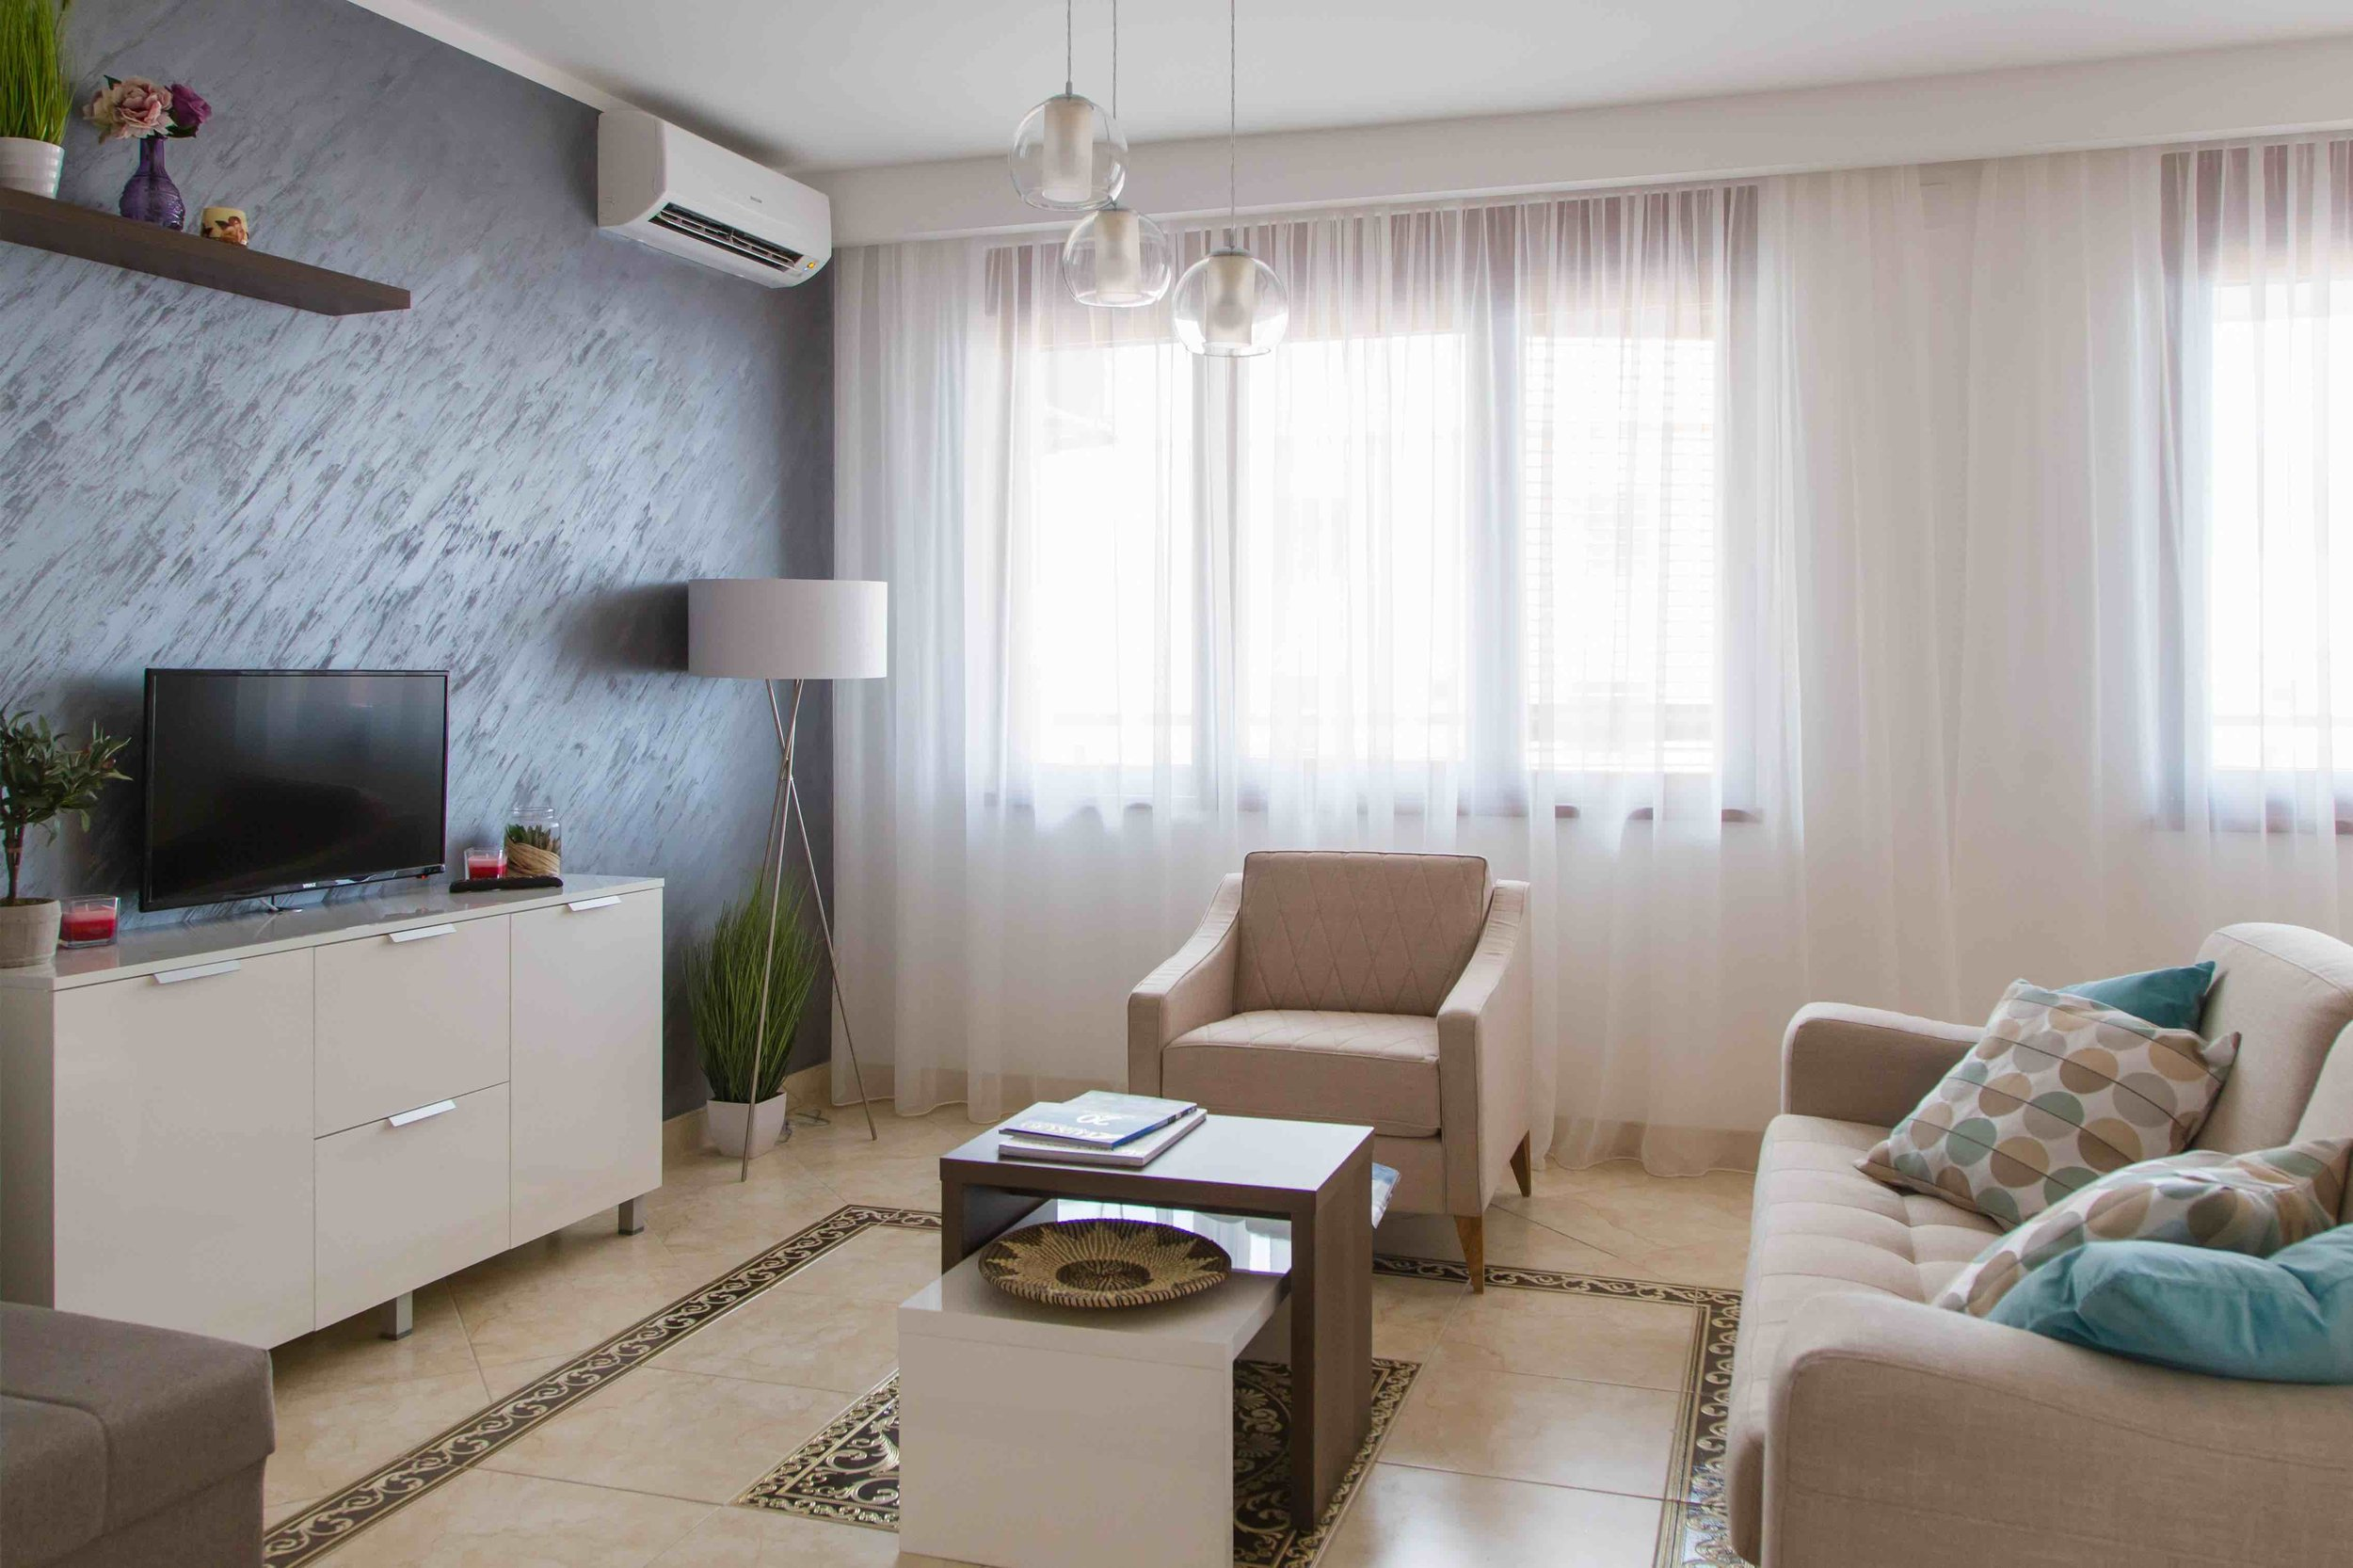 Aparthotel Апартотель | Anatolia |Becici Бечичи | Budva Будва | Montenegro Черногория | Apartments Апартаменты | Rents Аренда 1.jpg